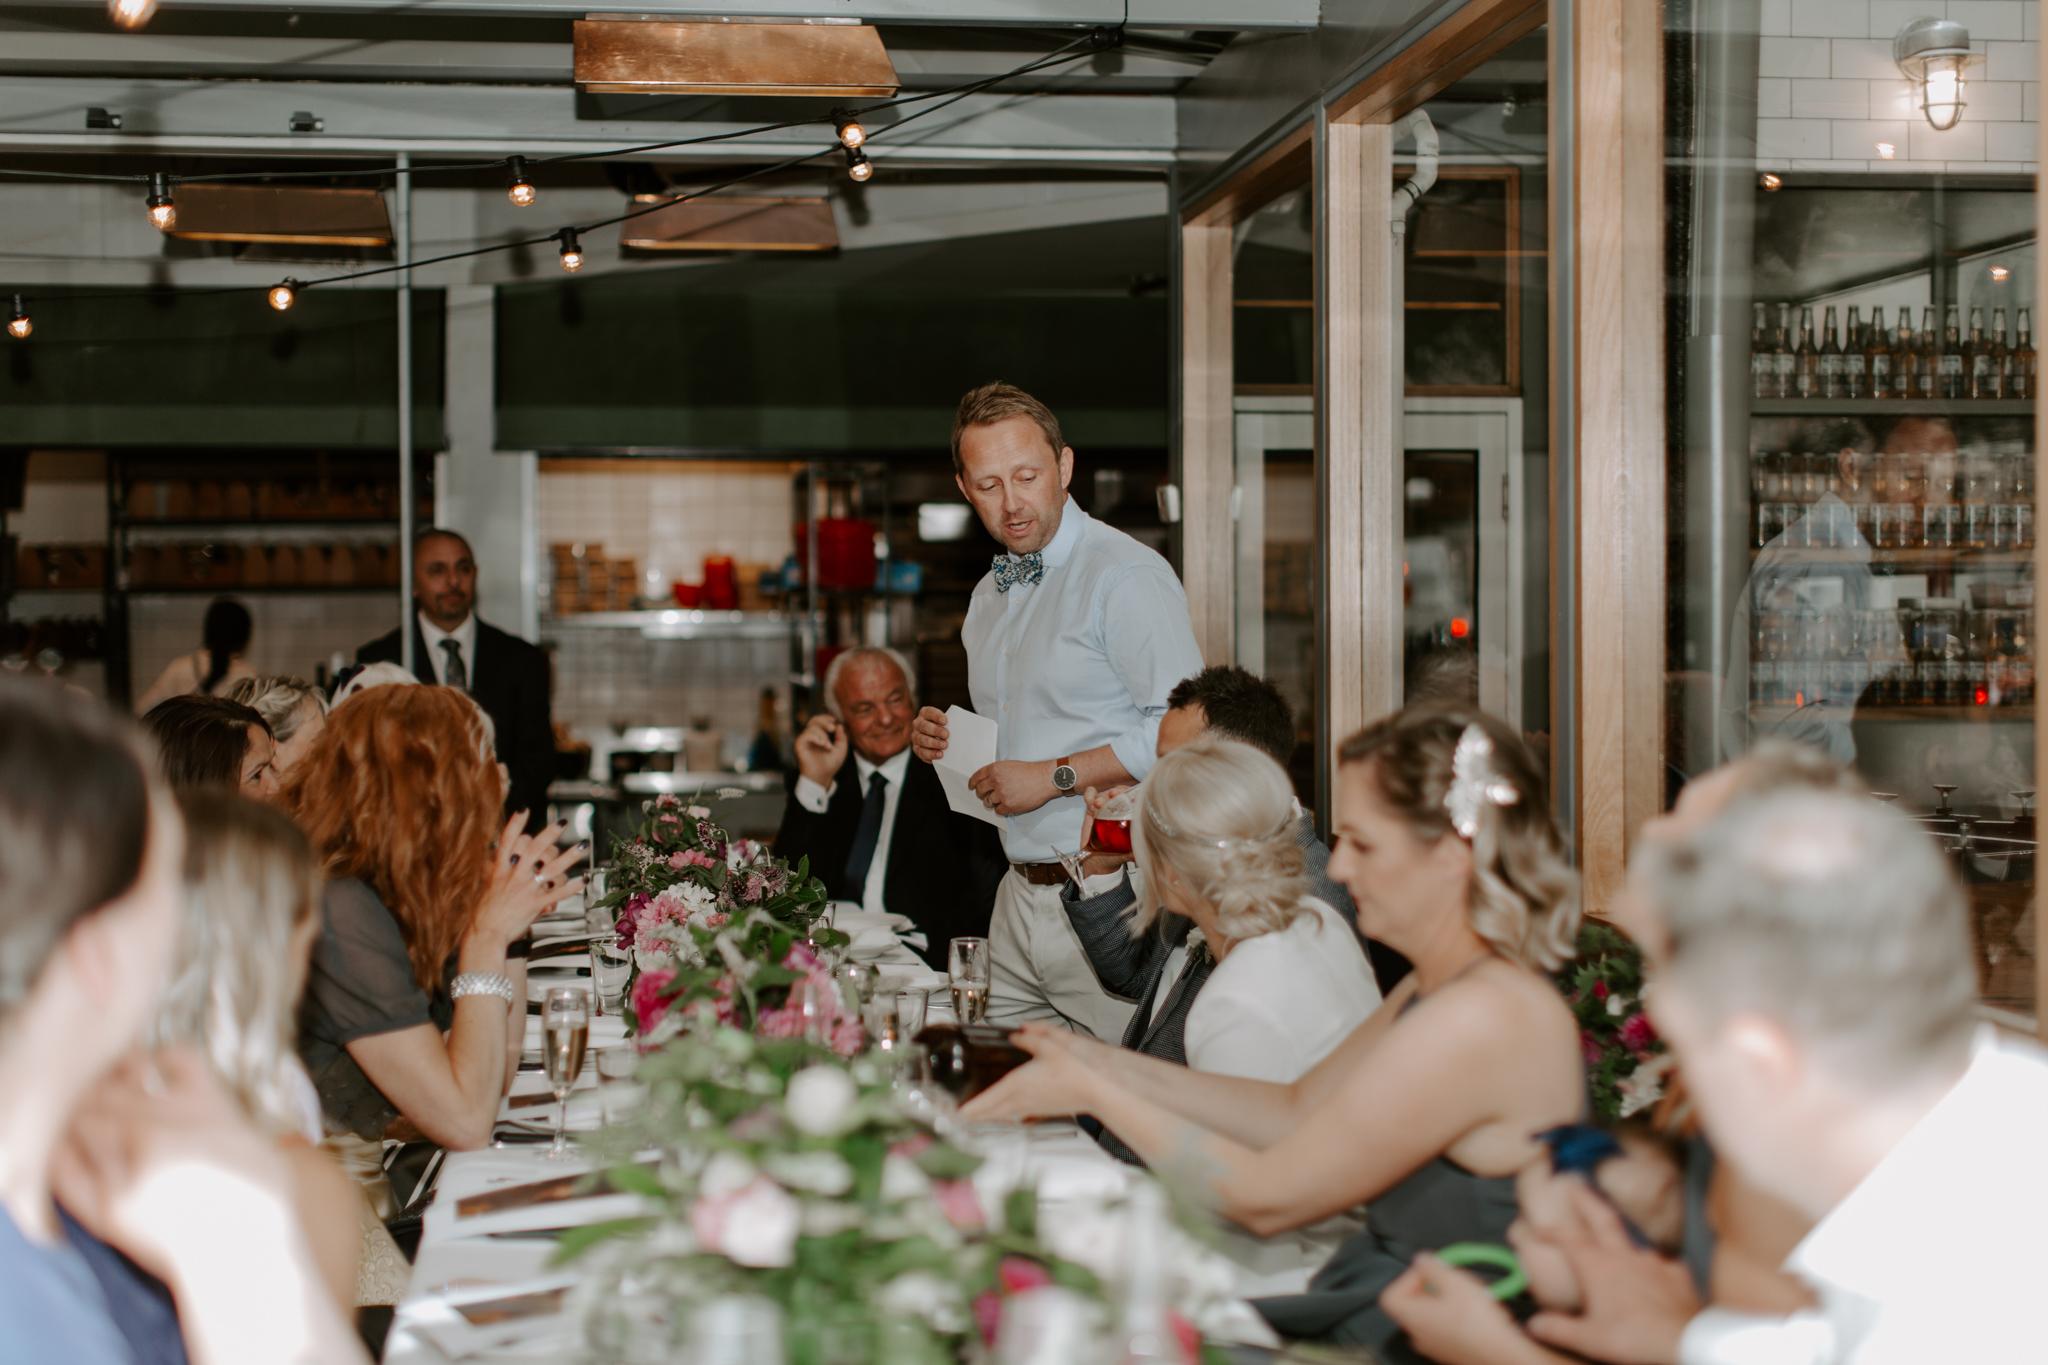 Trunk-restaurant-wedding-EmotionsandMath-063.jpg